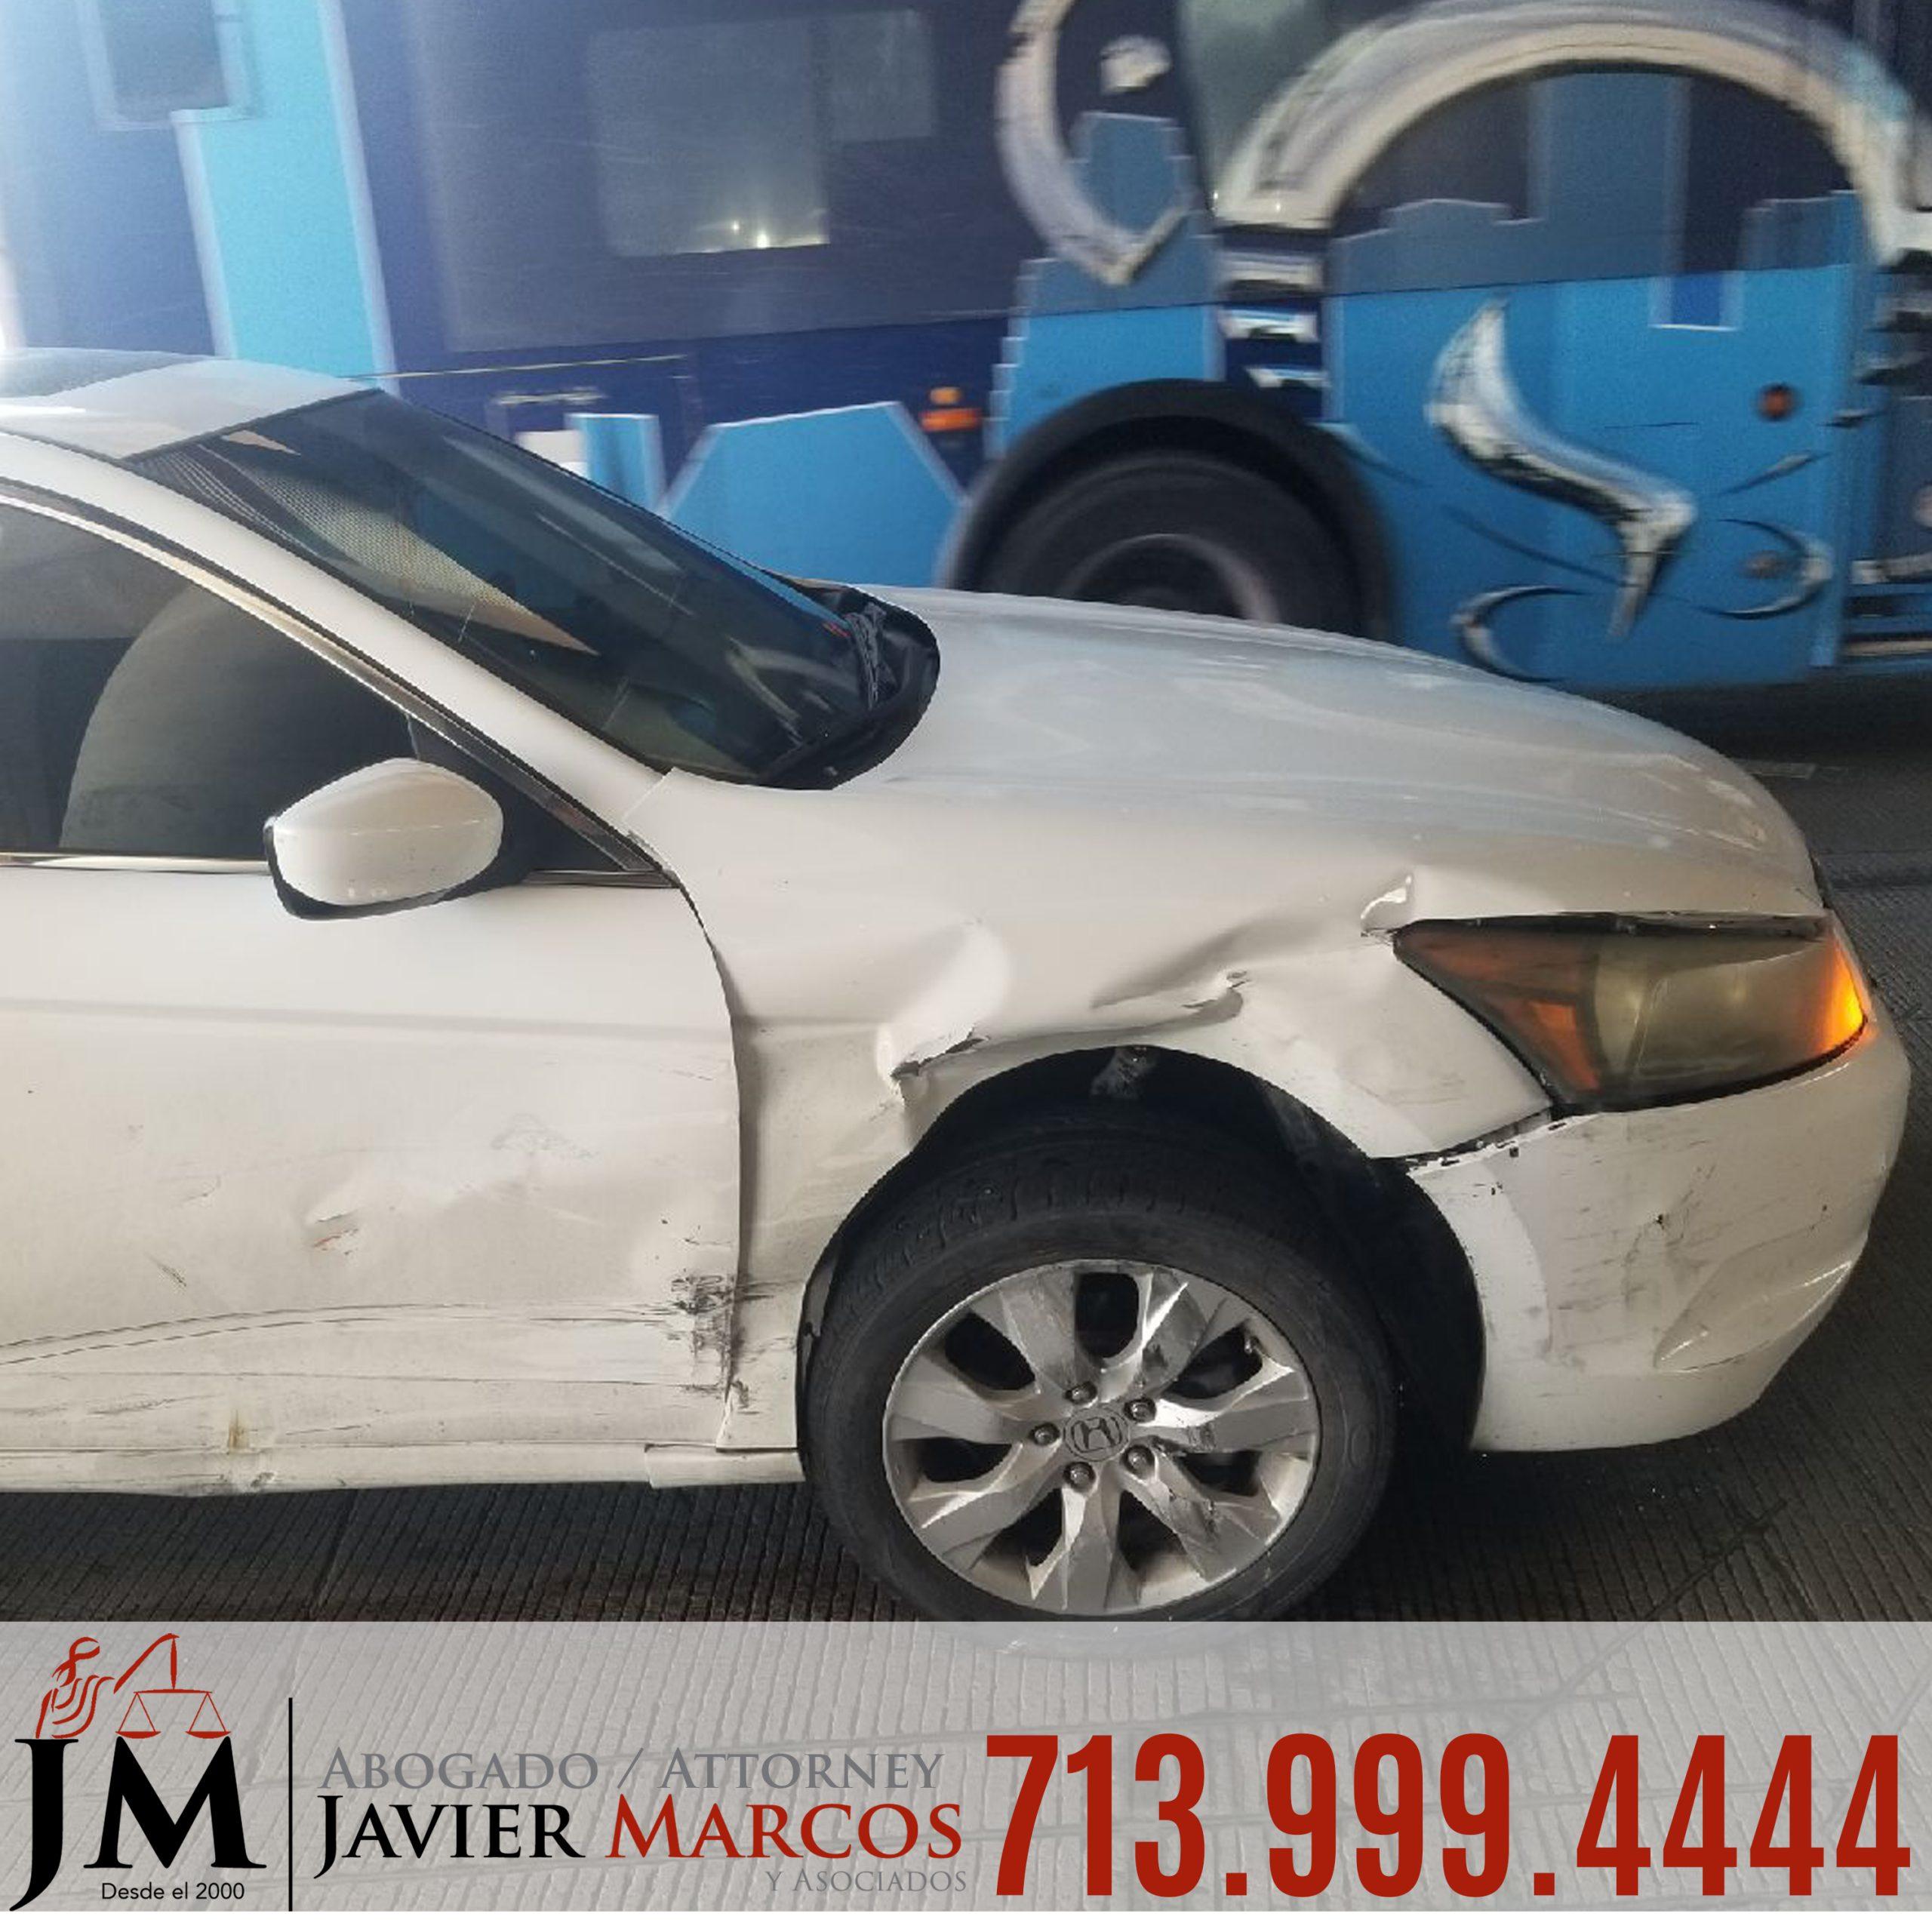 Reclamo de Accidentes Houston | Abogado Javier Marcos | 713.999.4444